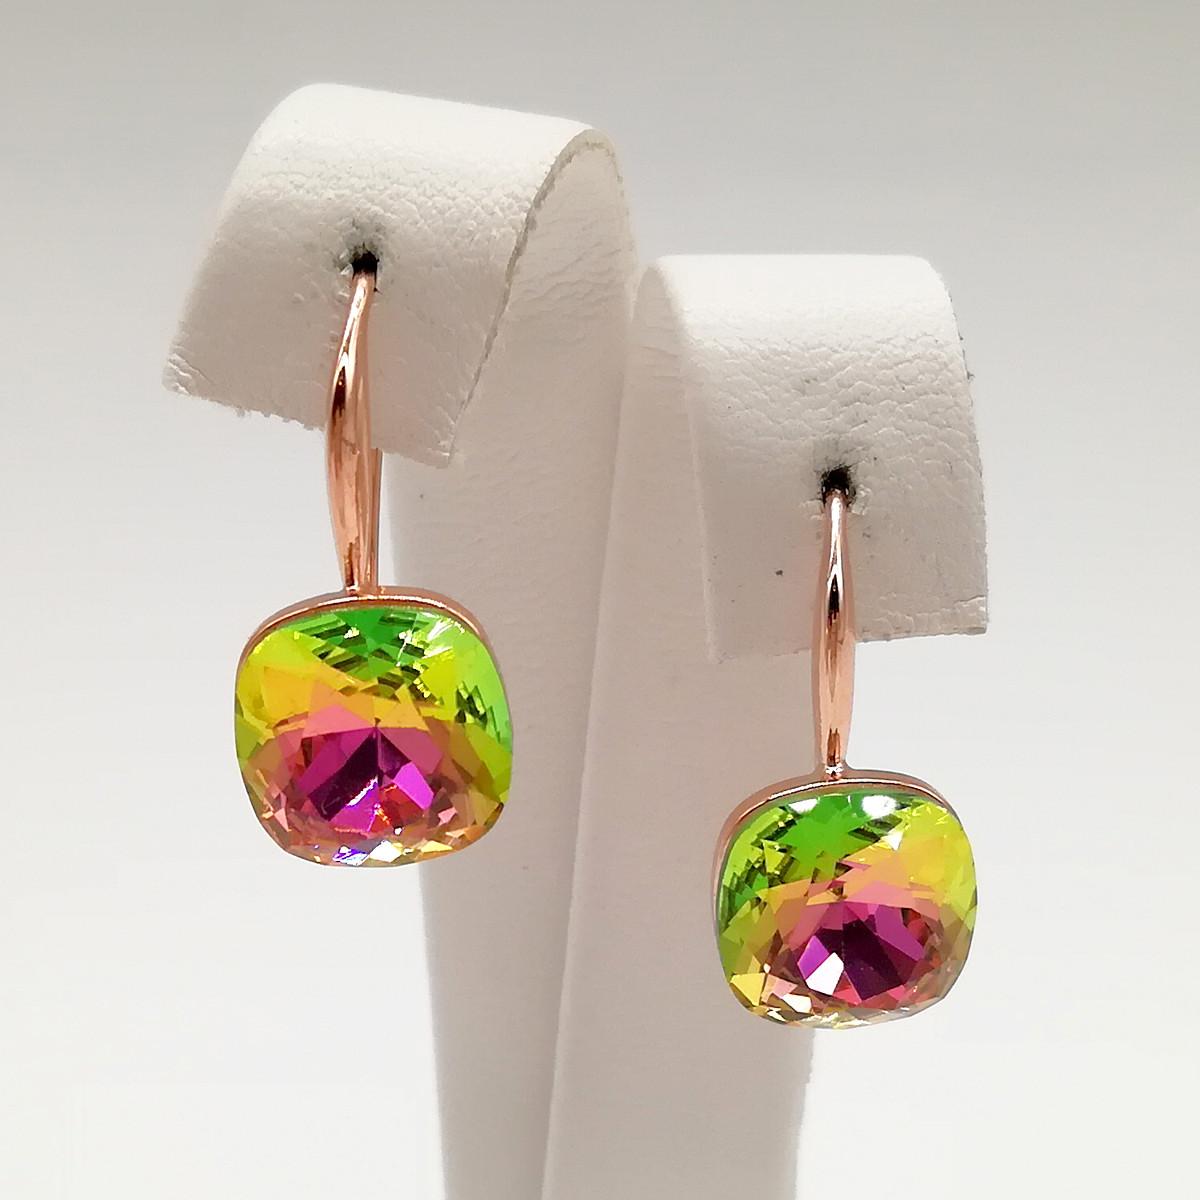 Серьги SONATA из медицинского золота, кристаллы Swarovski зелено-розового цвета, позолота PO, 24774